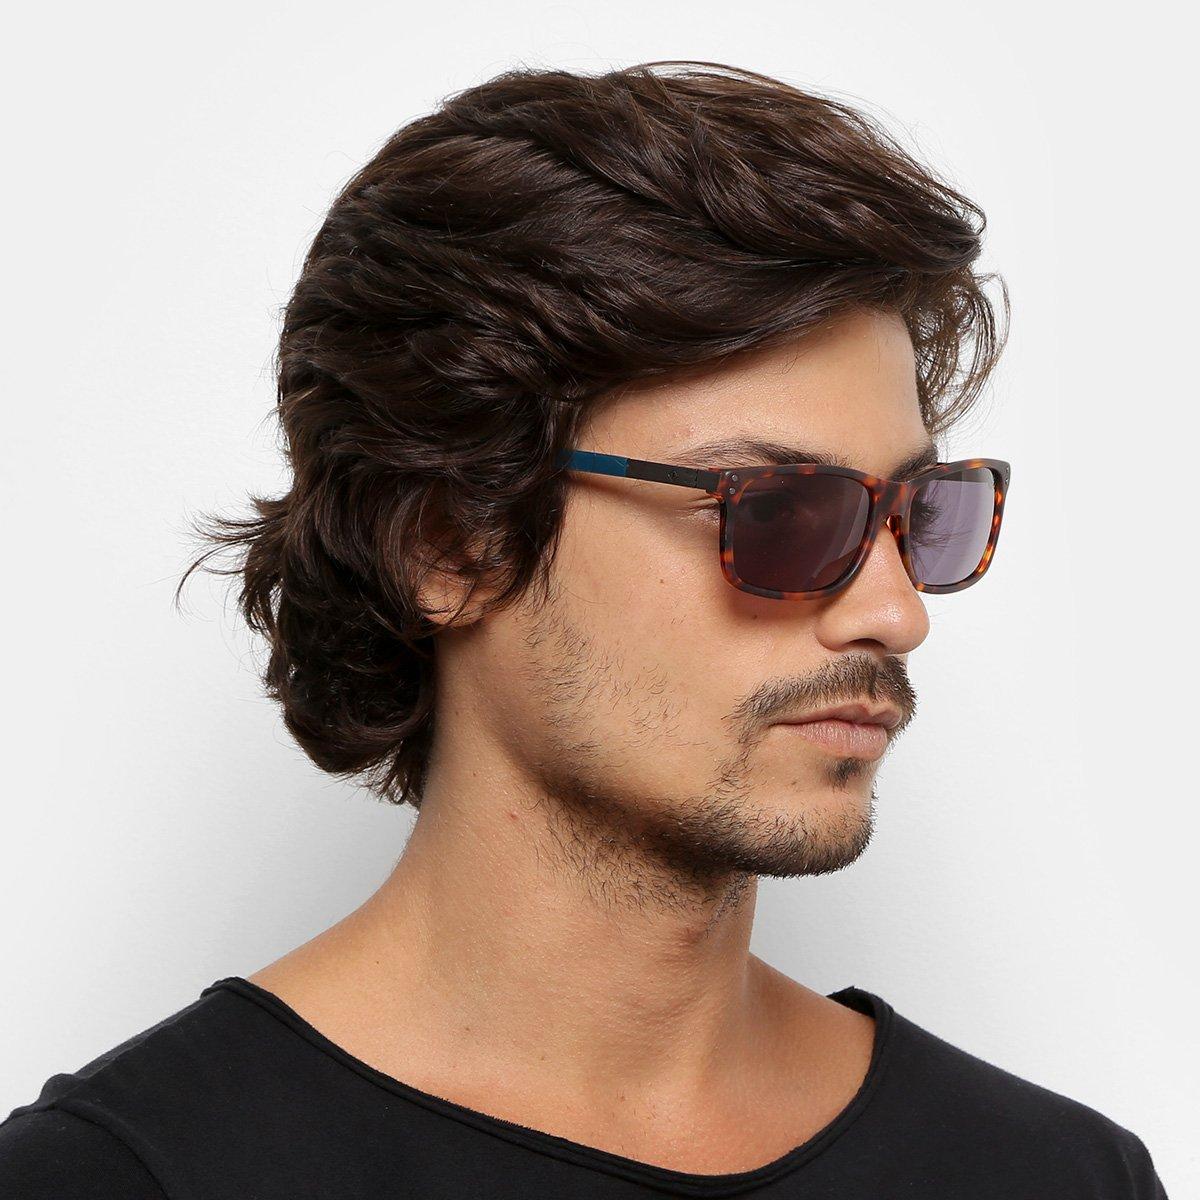 181558c01 Óculos de Sol Forum Degradê Masculino - Shopping TudoAzul